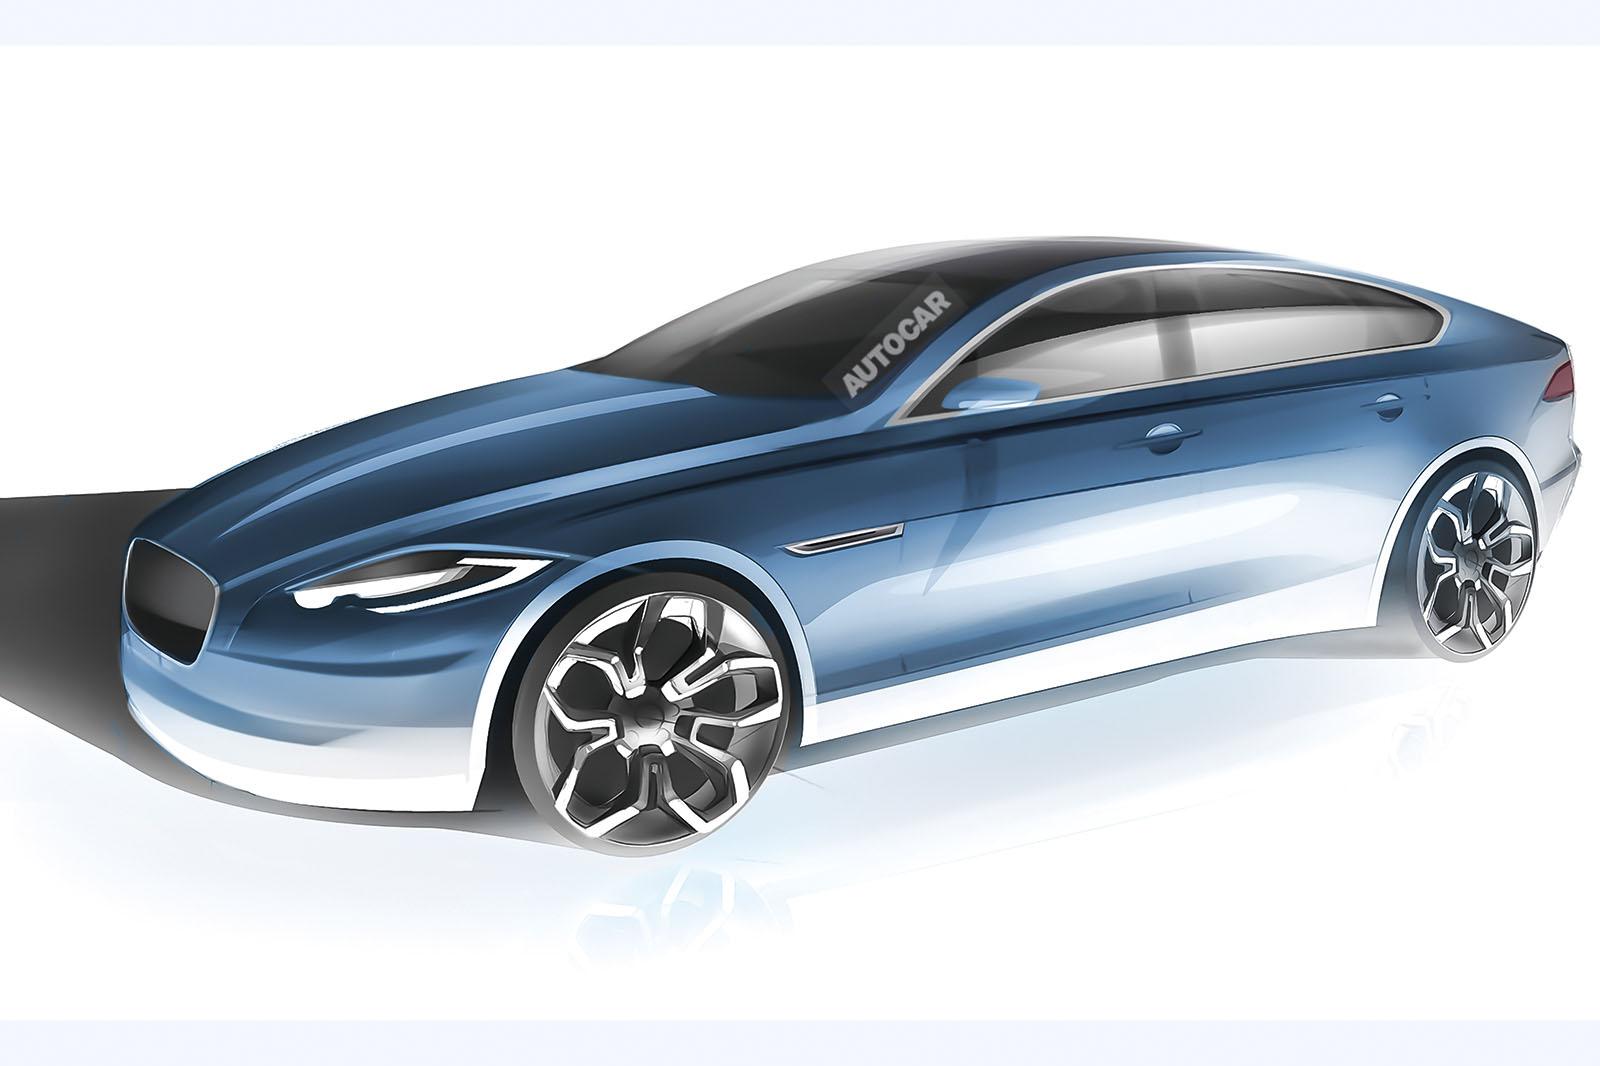 Jaguar XJ will be replaced, confirms design boss | Autocar